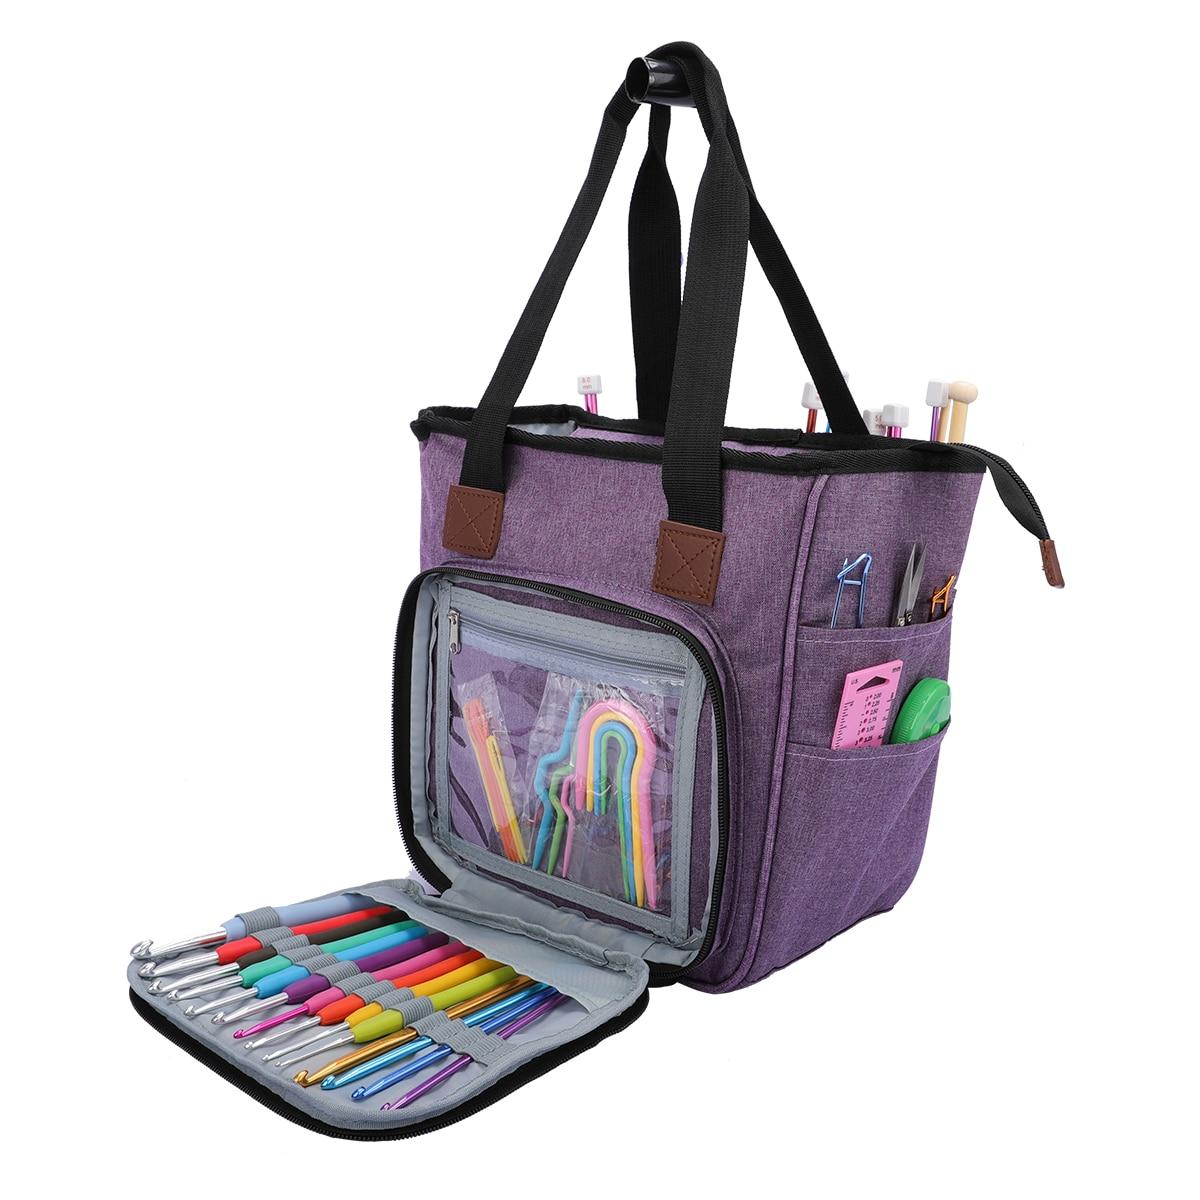 Crochet Hooks Thread Yarn Storage Bag Wool Knitting Needles Household Tote Organizer Sewing Kit DIY Travel Storage Bag For Mom